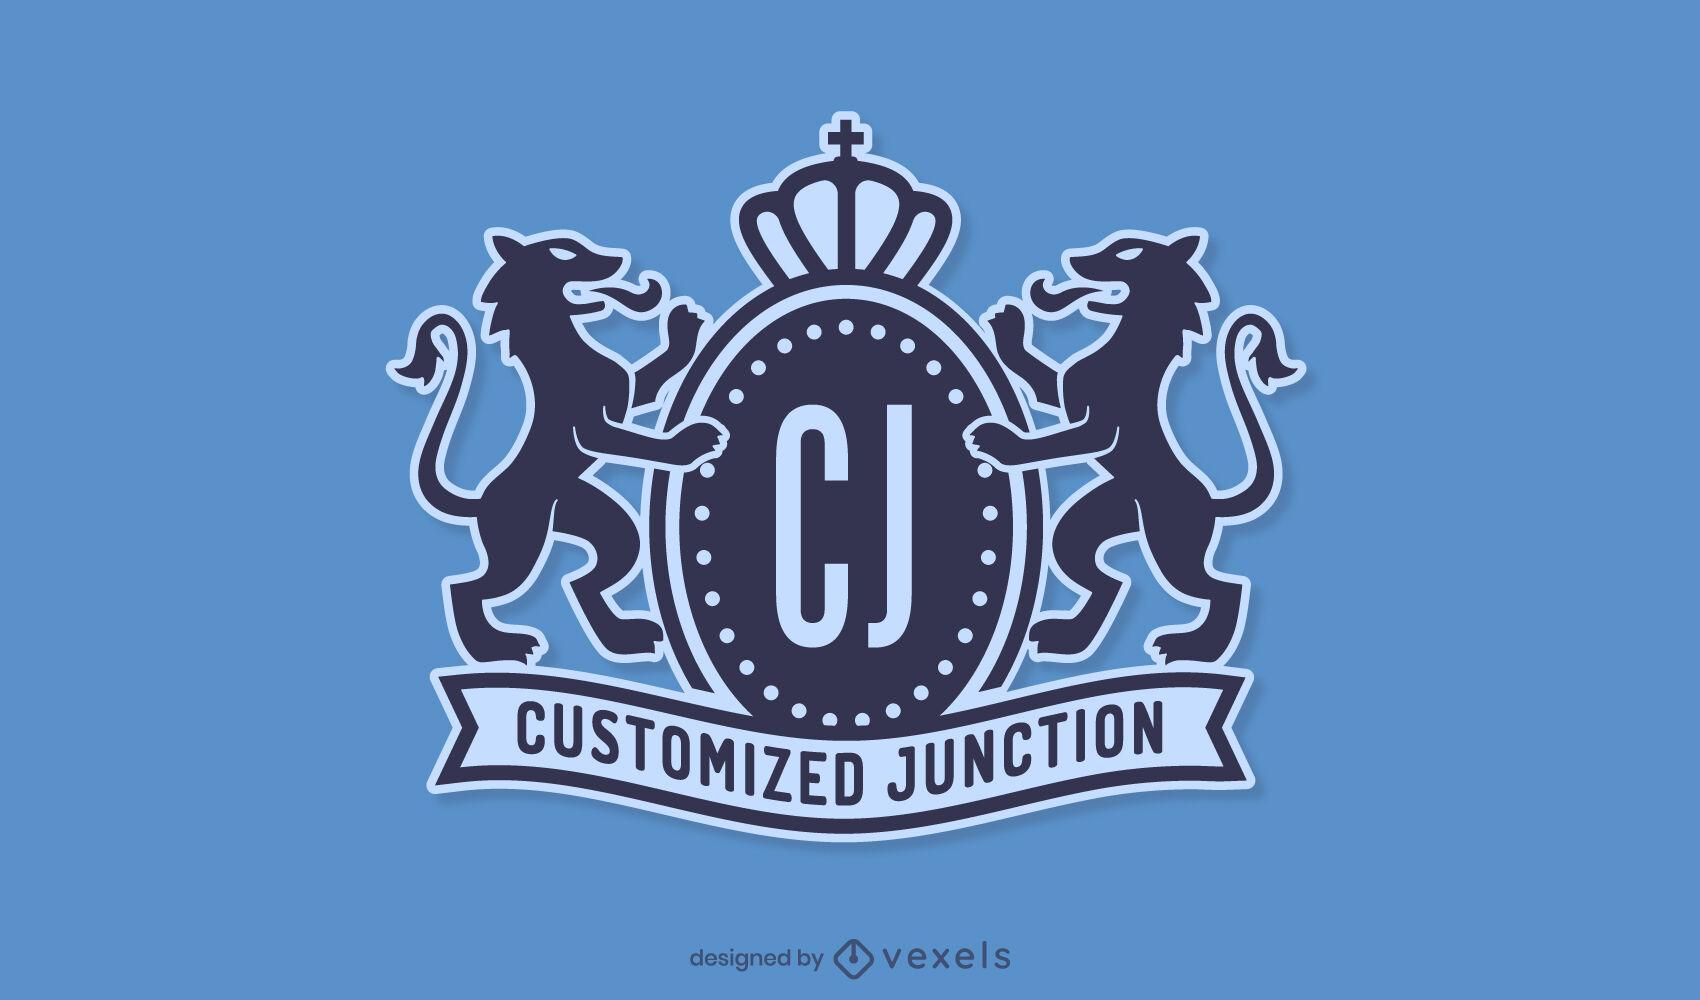 Elegant crown business logo design